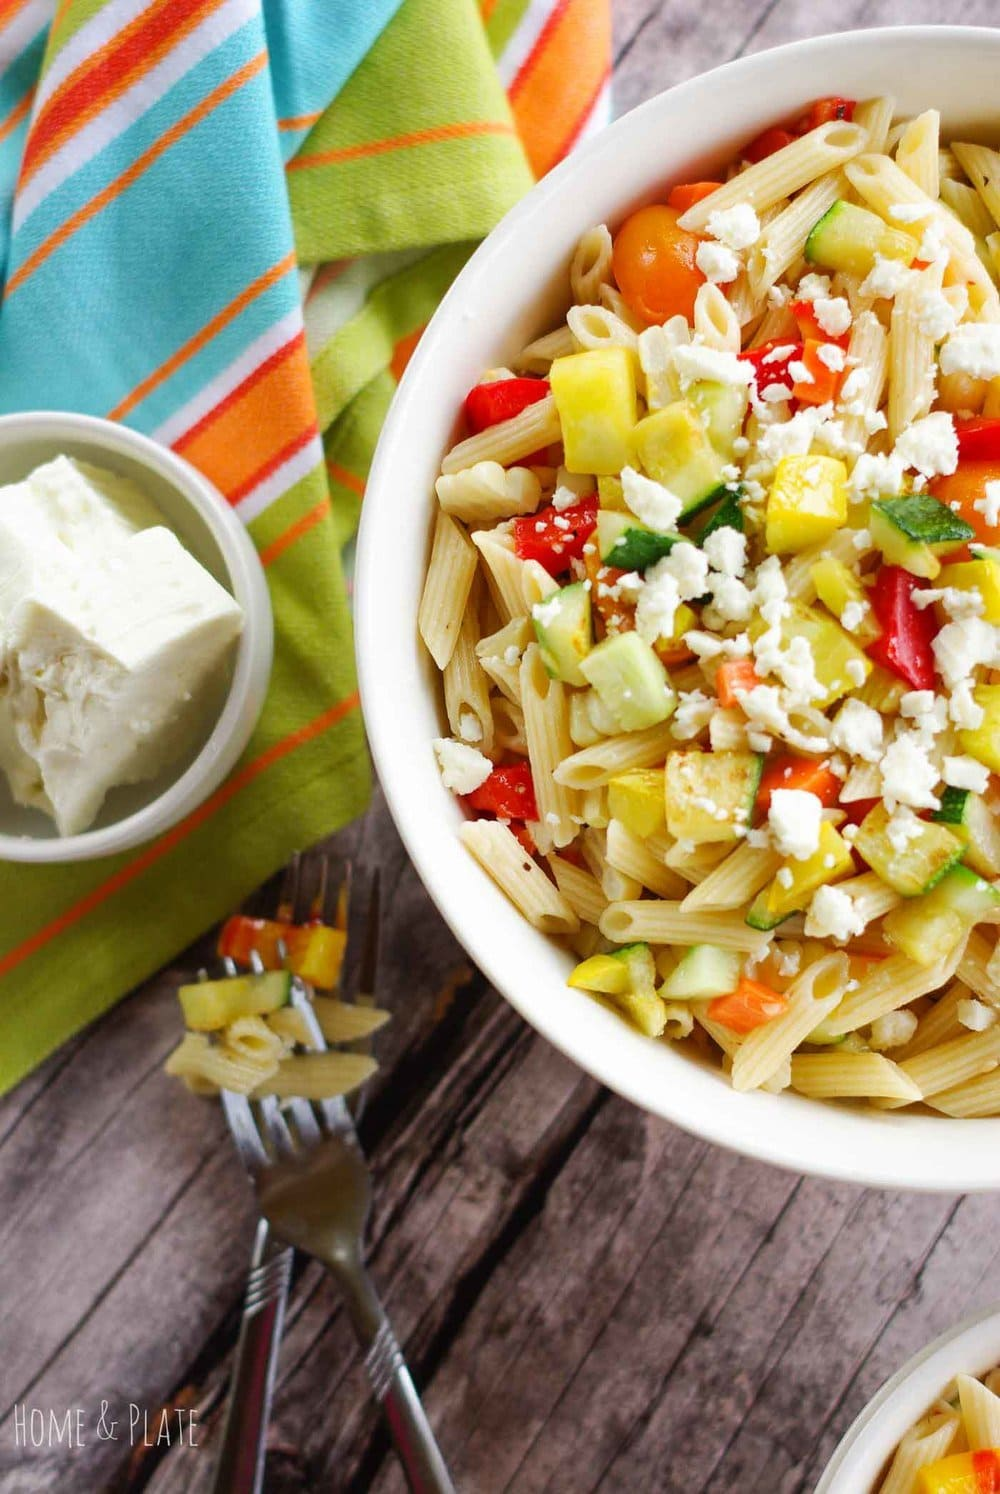 Summer Veggie Pasta Salad | www.homeandplate.com | Enjoy a rainbow of vegetables in this easy-to-make summer pasta salad.